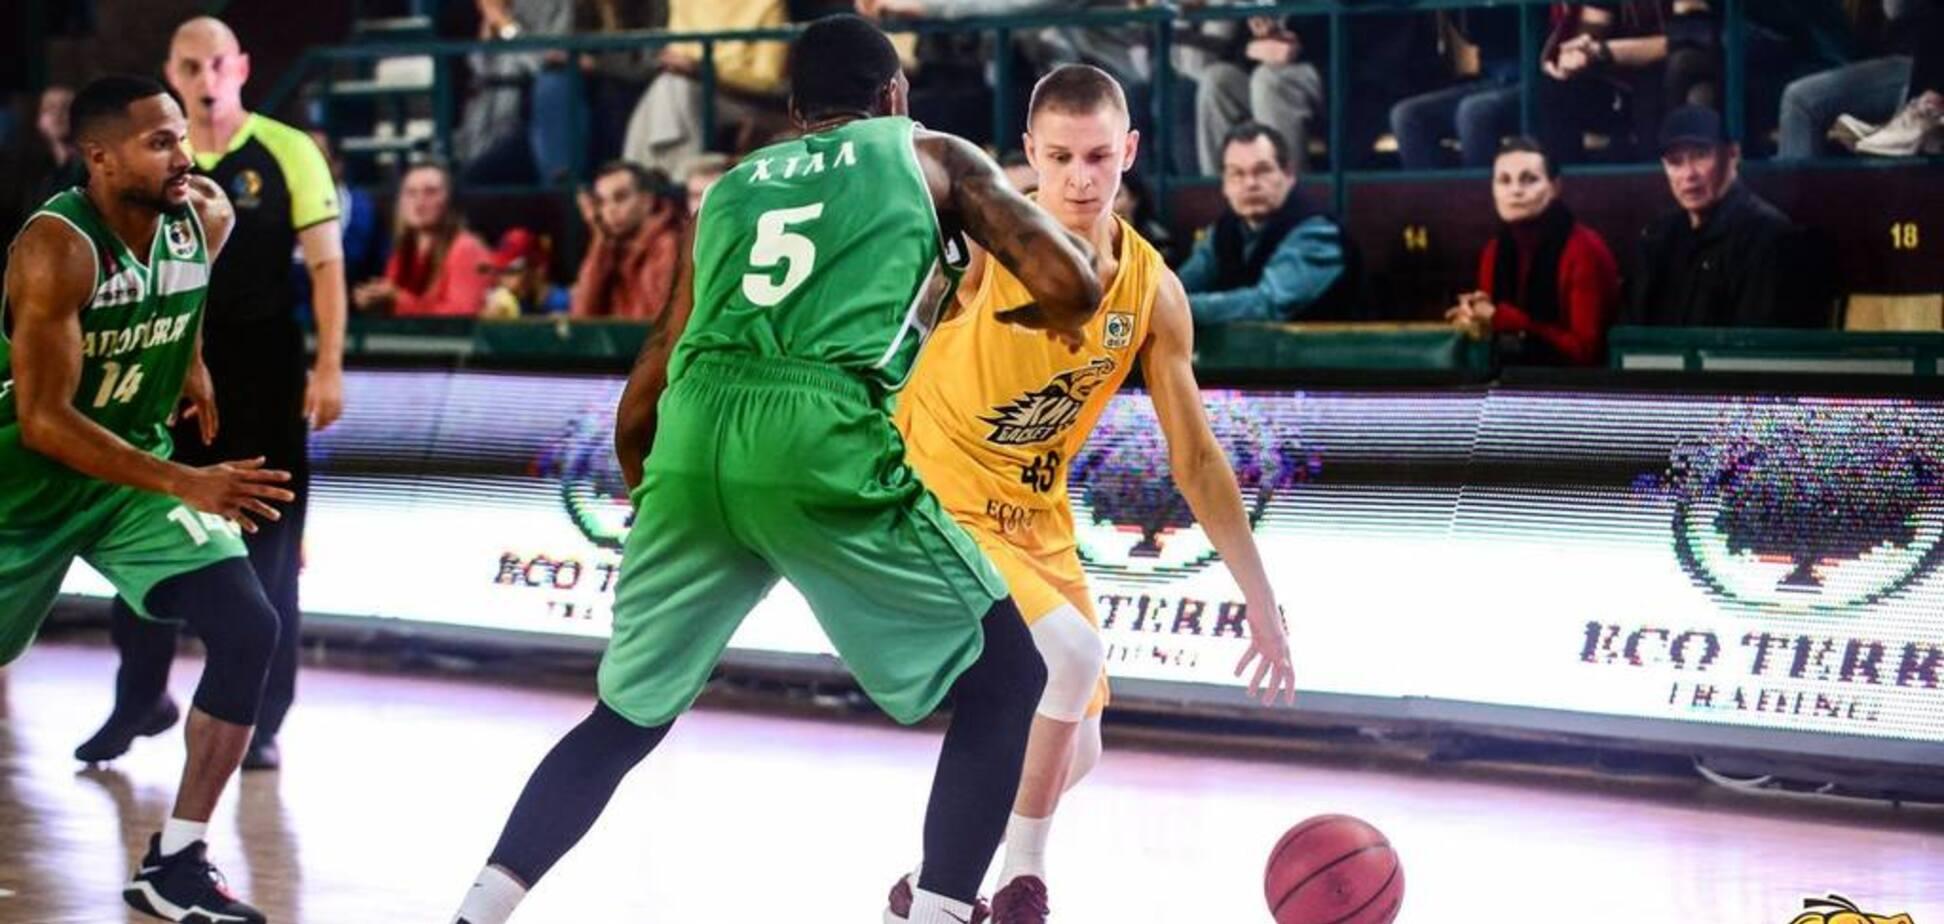 'Киев-Баскет' драматично проиграл в Суперлиге Пари-Матч